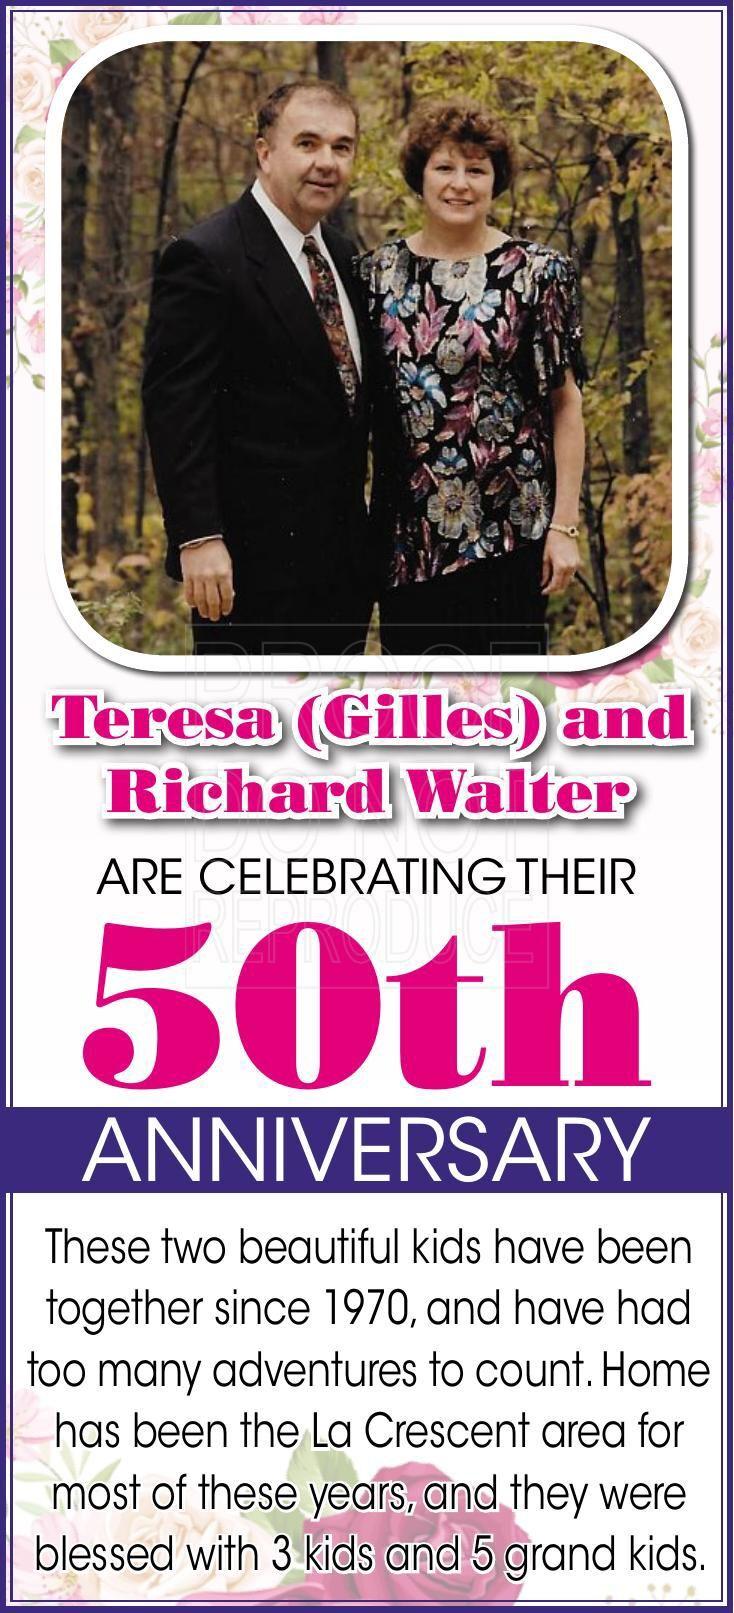 Richard and Teresa Walter 50th Anniversary